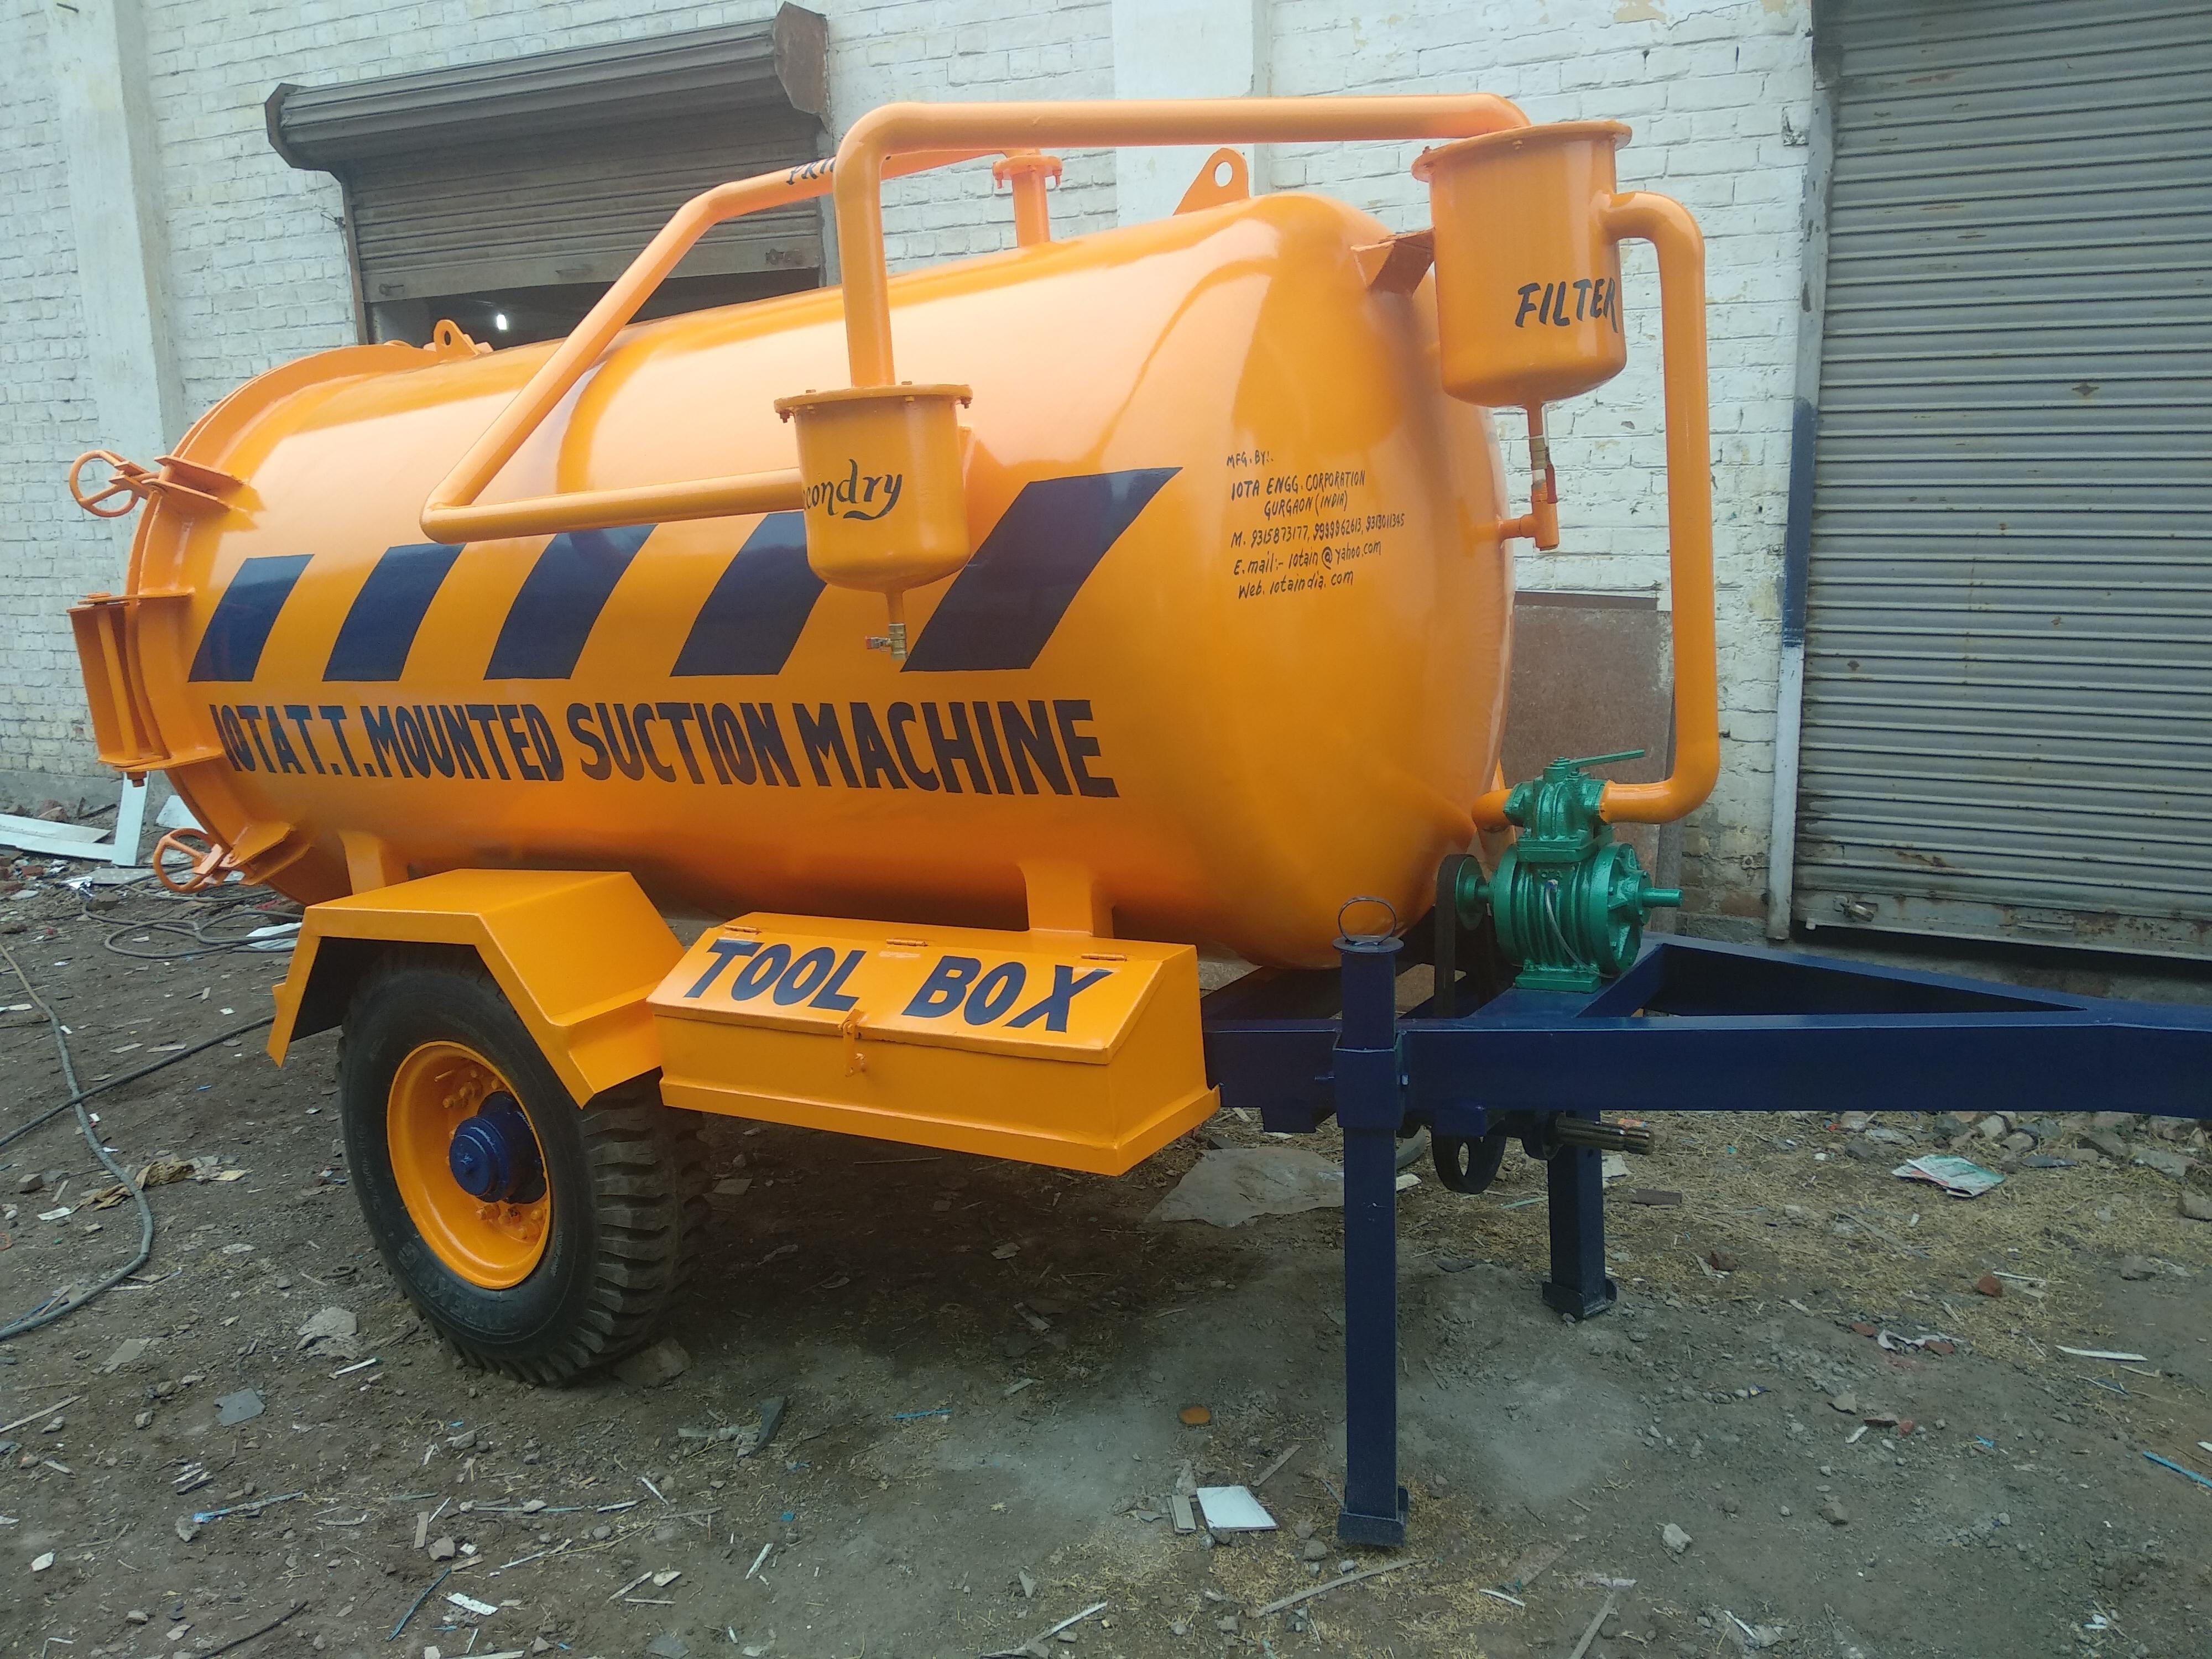 Trailer Mounted Suction Machine